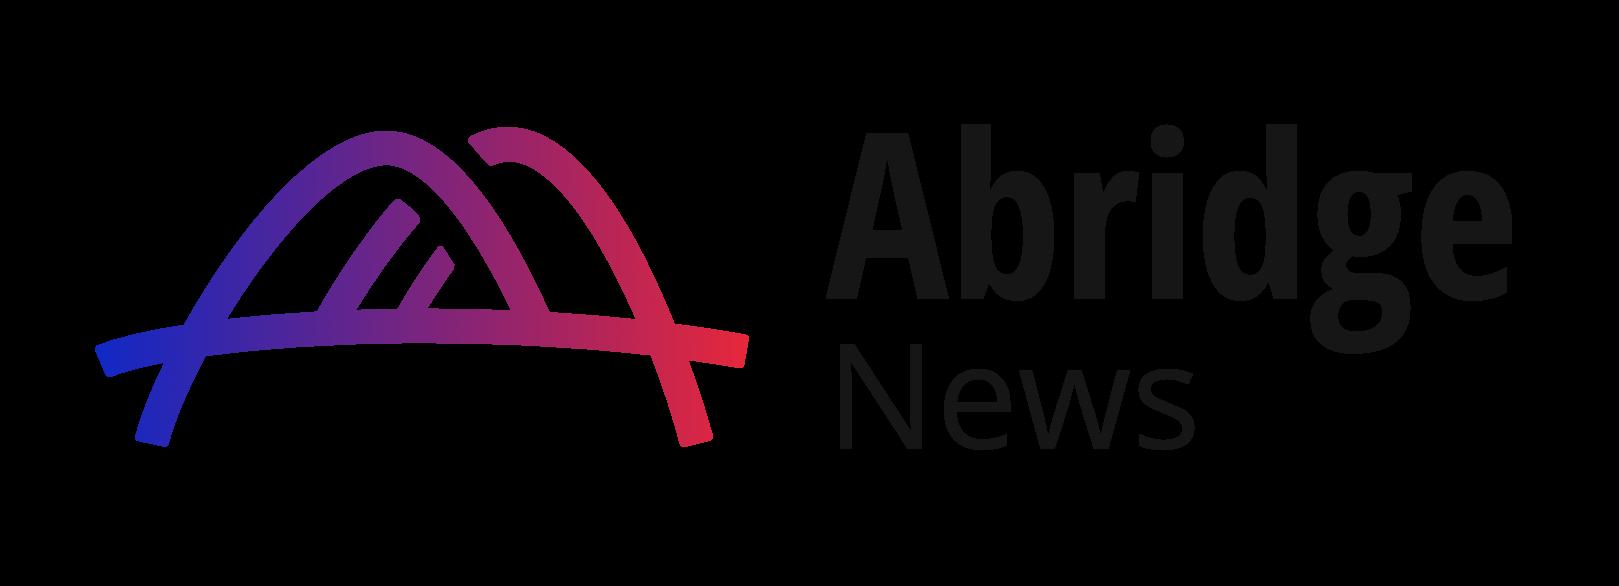 Abridge News' logo